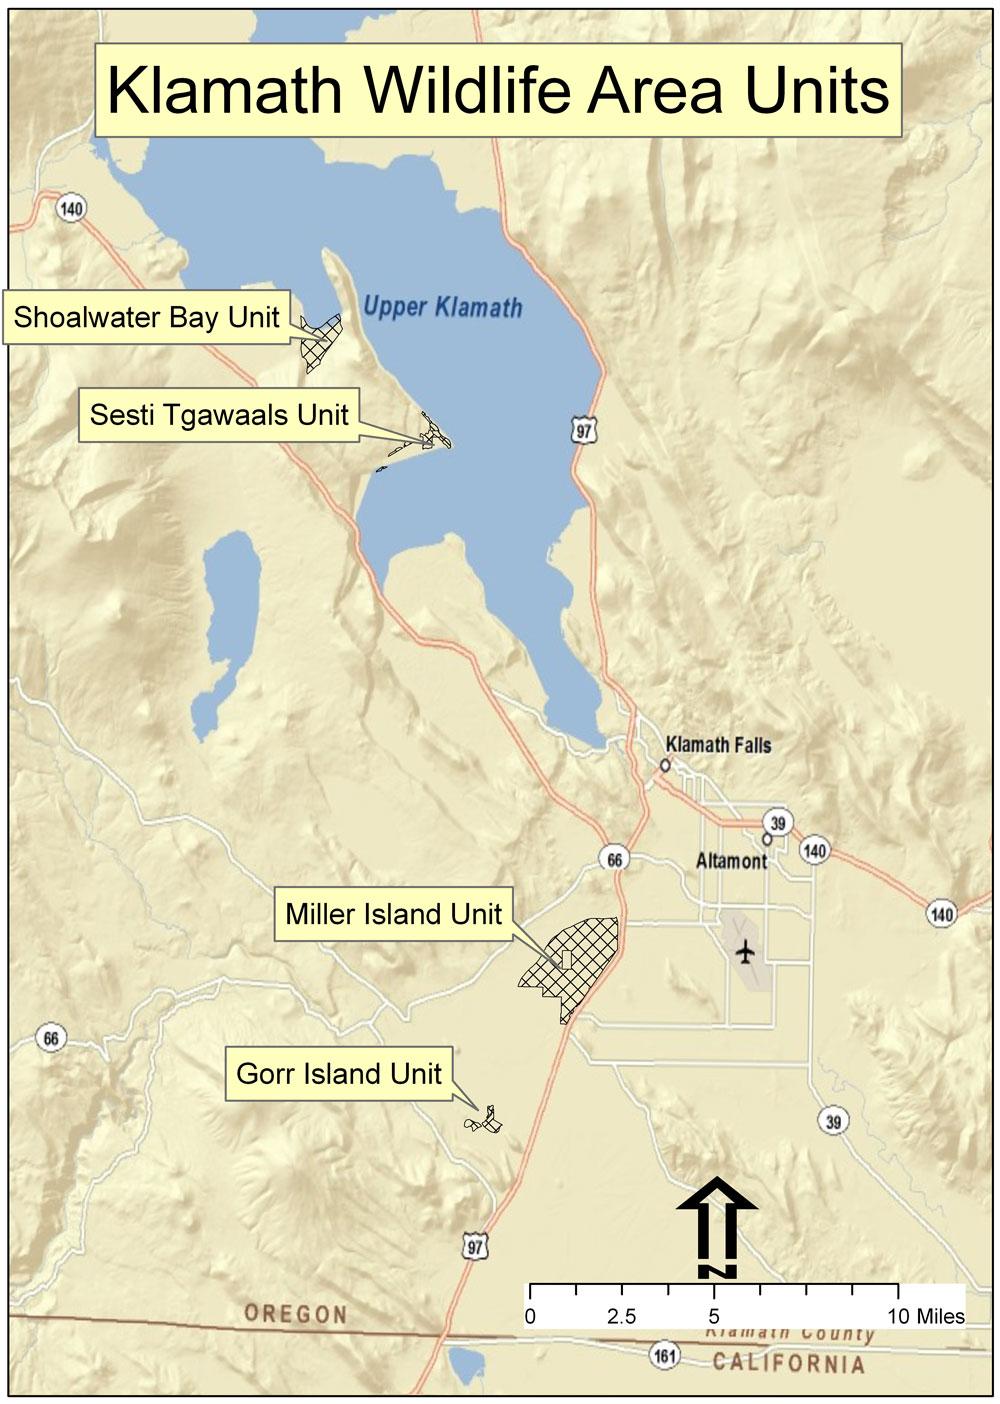 Klamath Wildlife Area Visitors Guide Oregon Department Of Fish